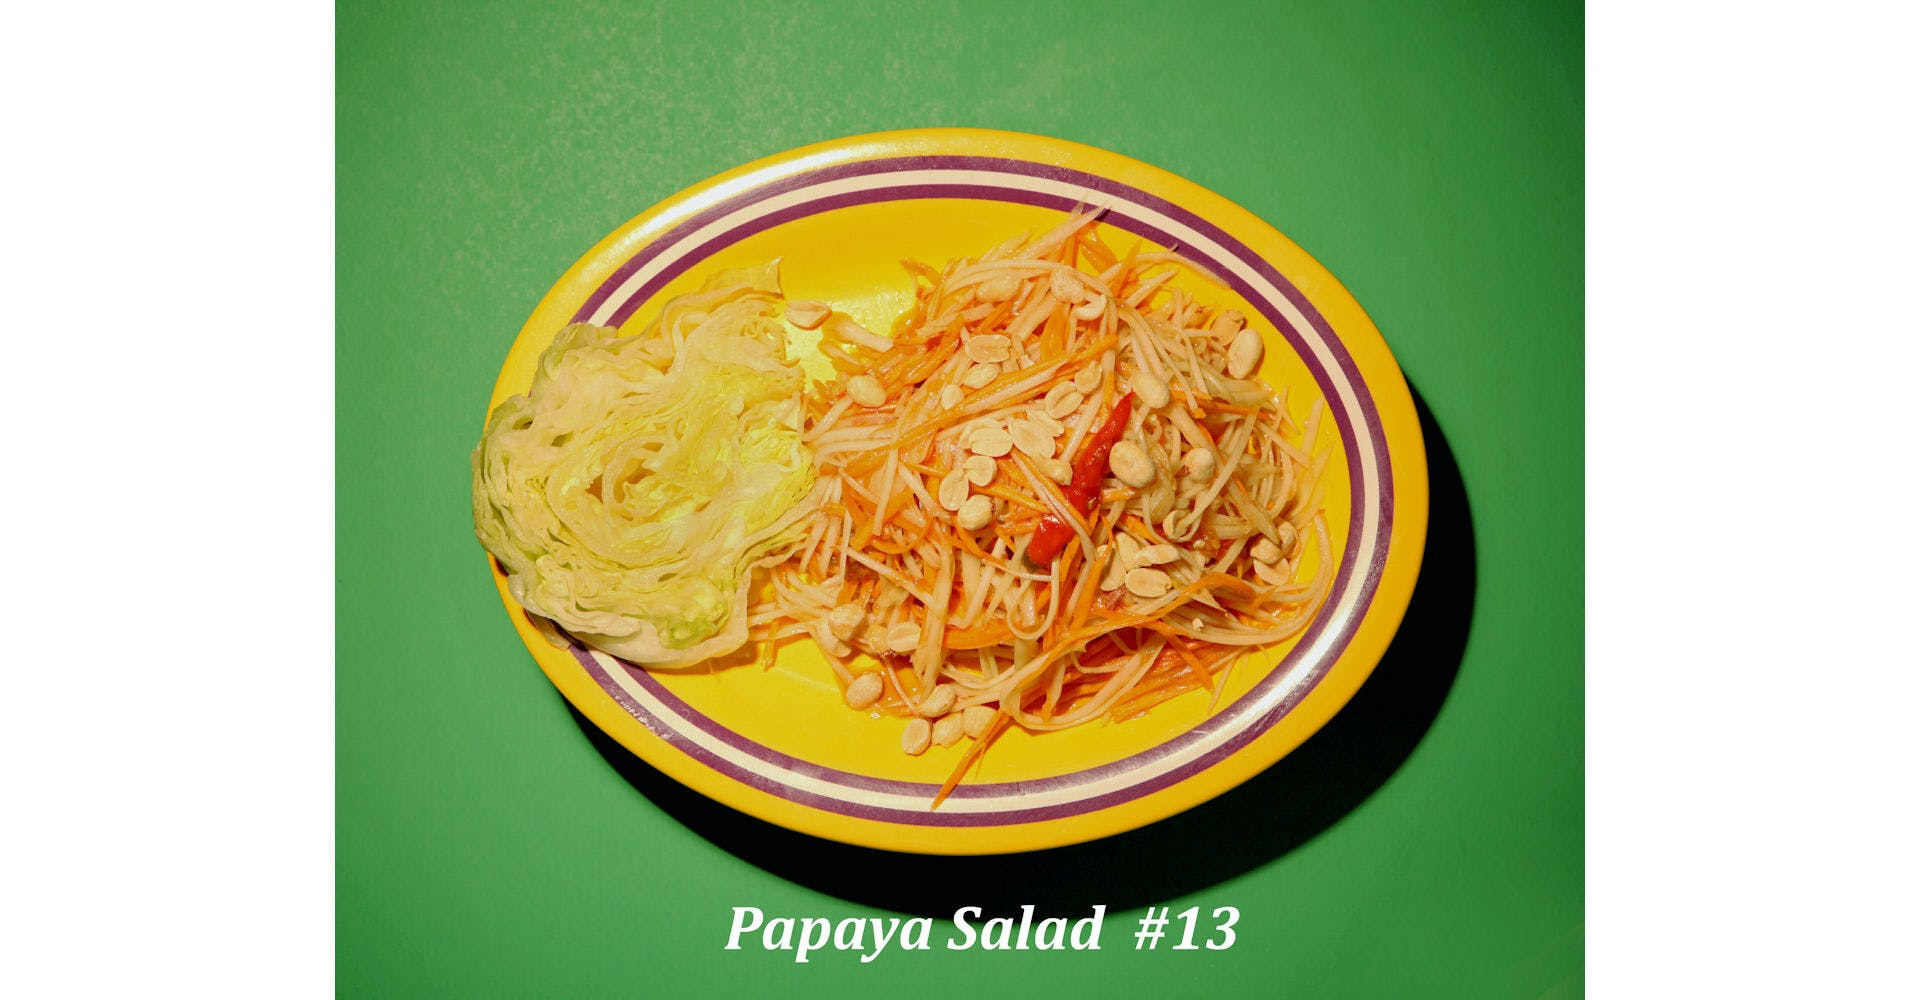 13. Papaya Salad from Narin's Thai Kitchen in Green Bay, WI